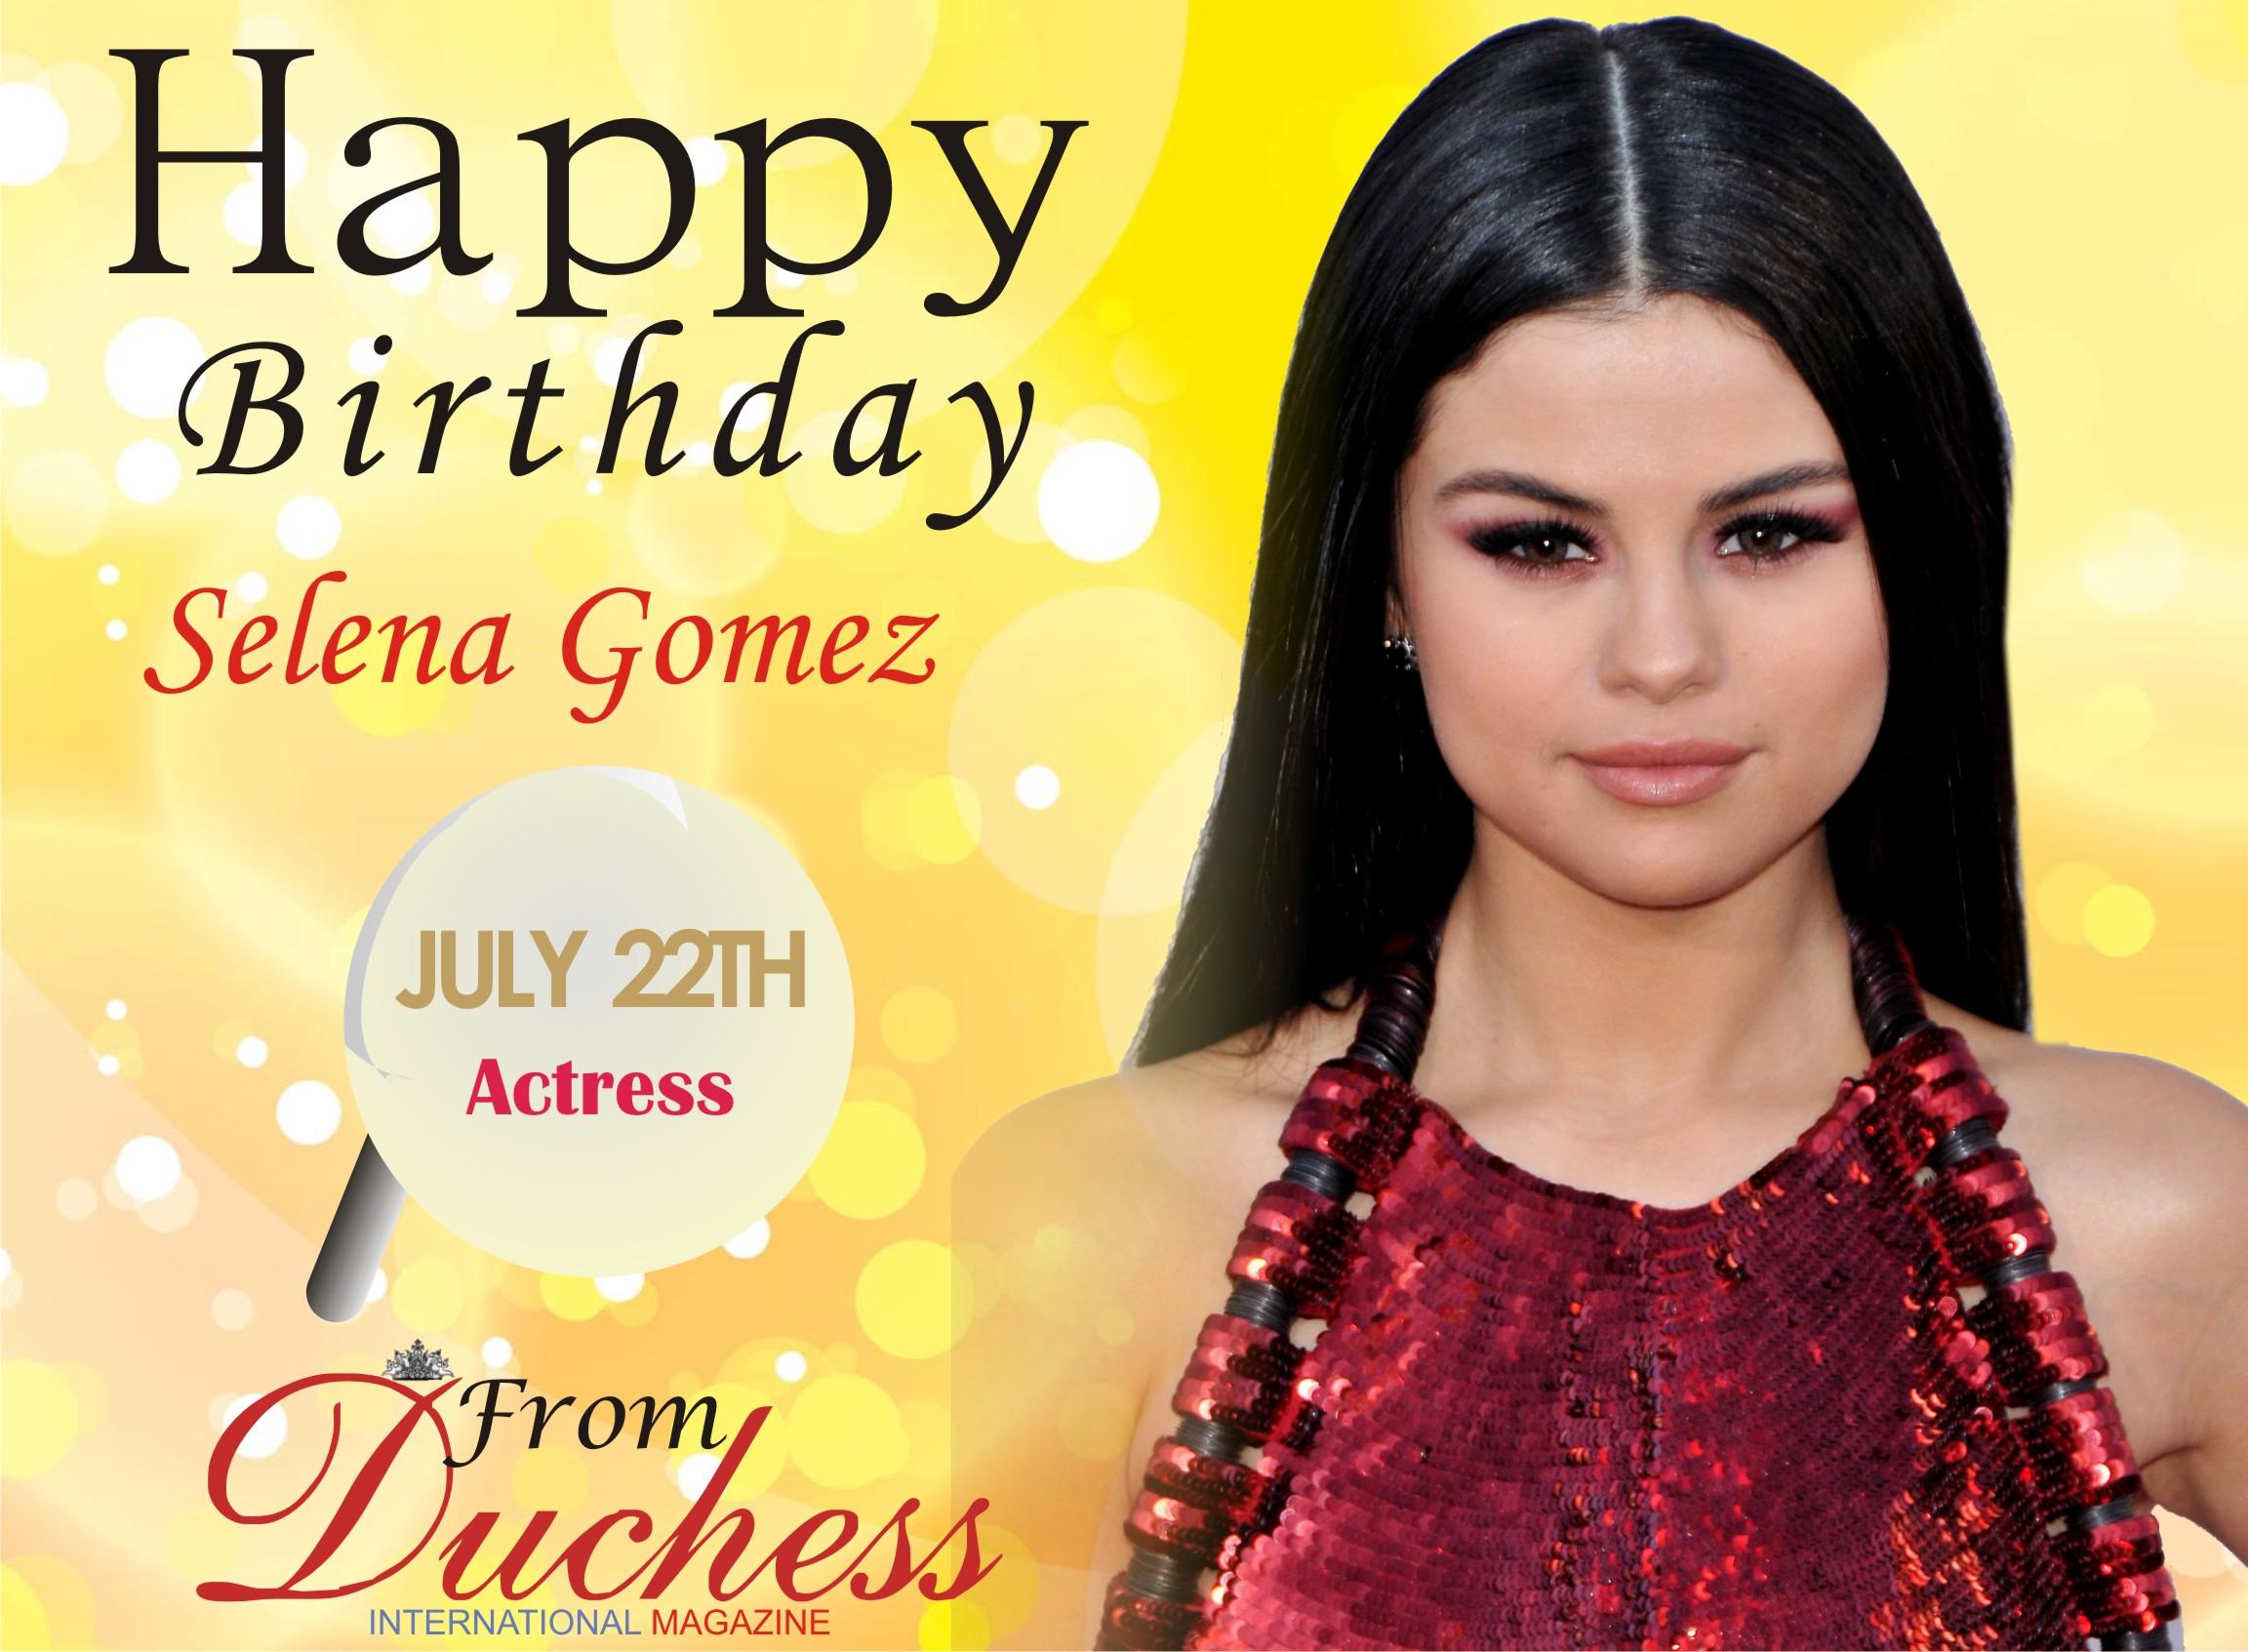 Happy Birthday Beautiful Selena Gomez